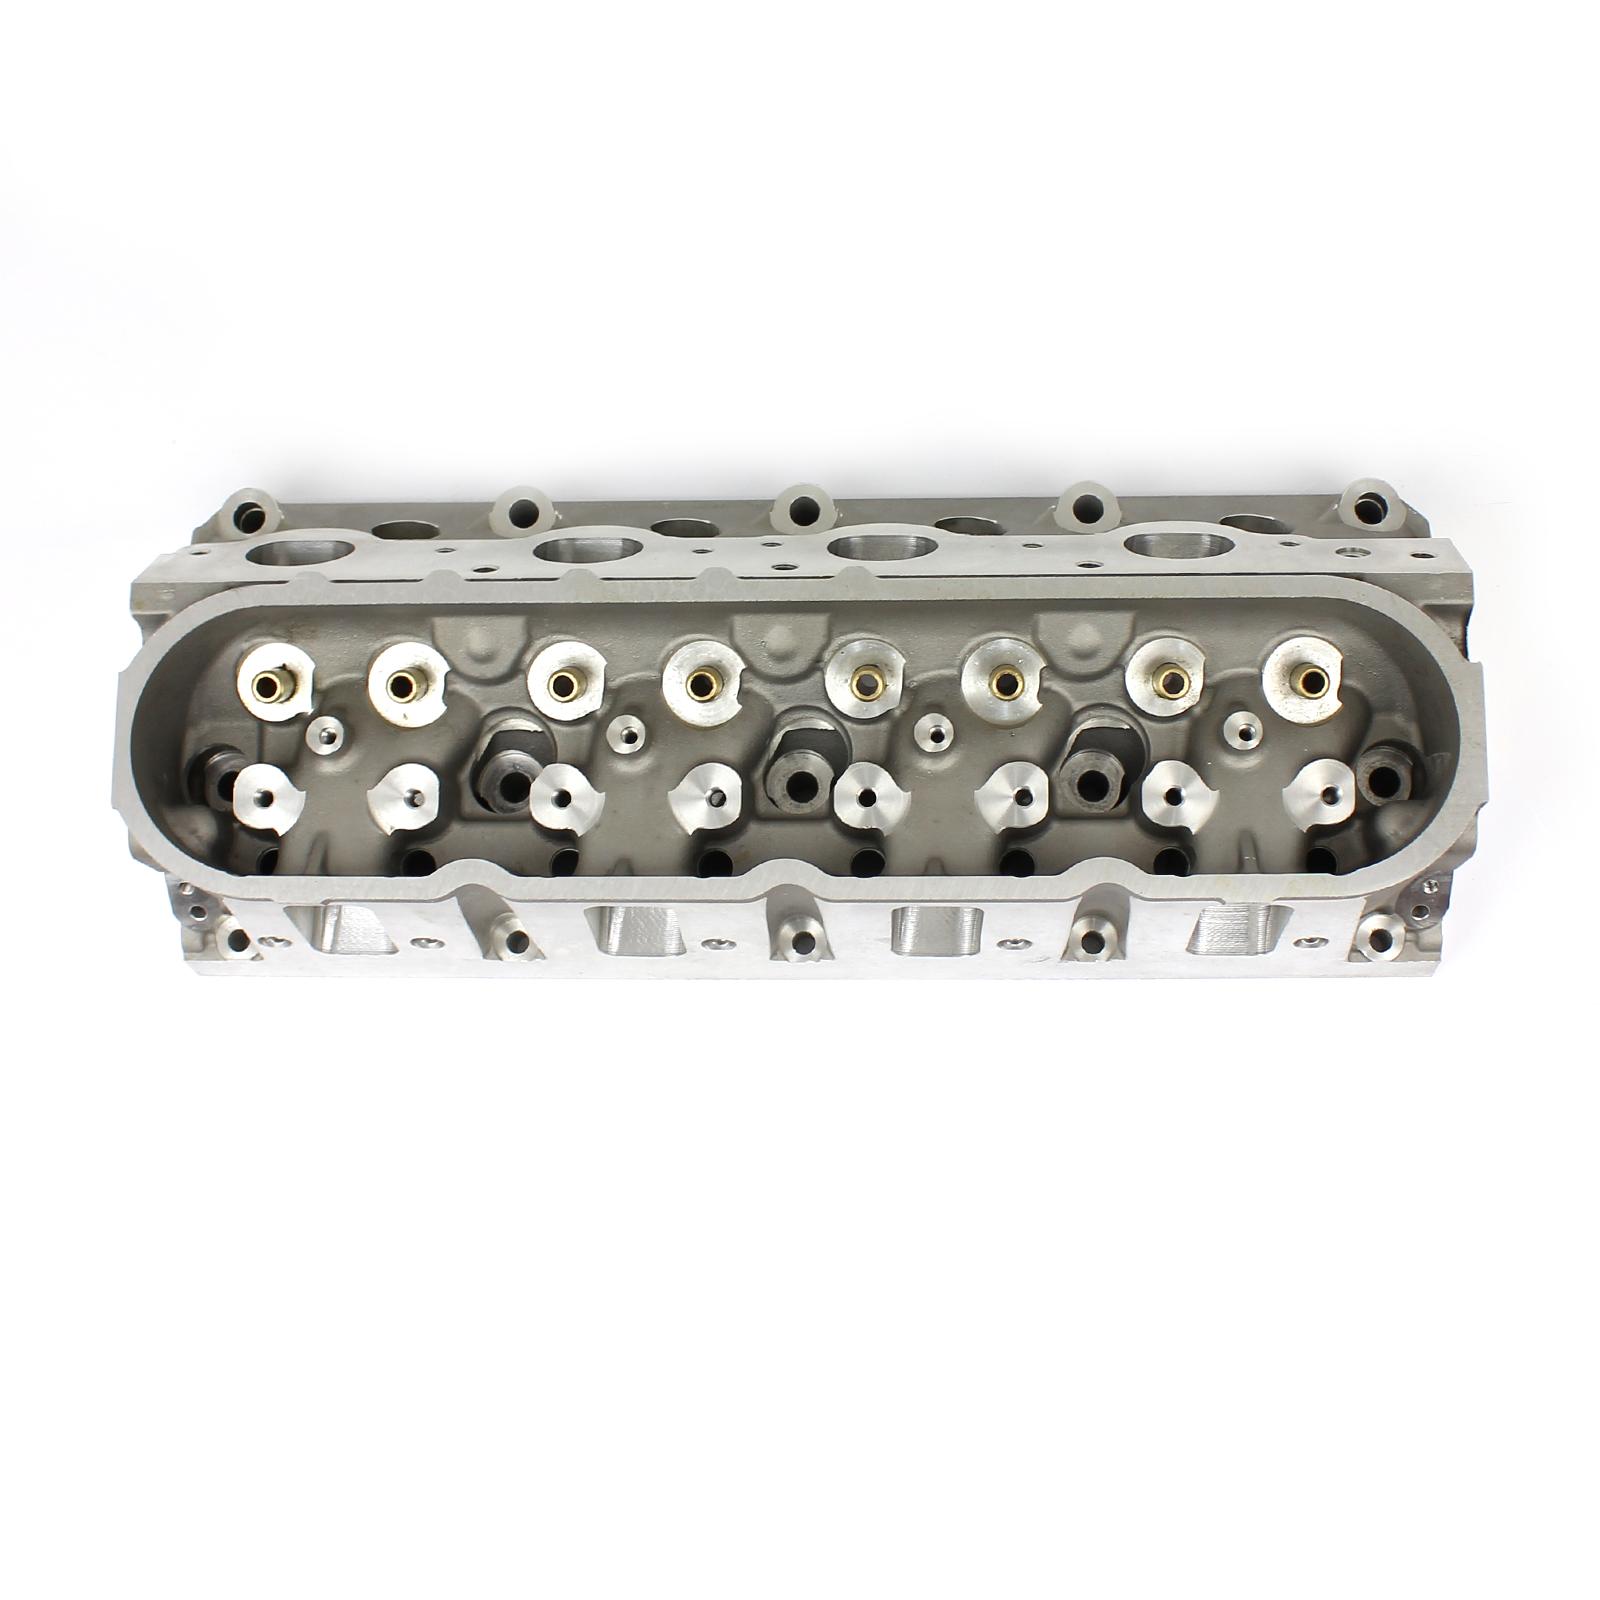 Speedmaster® PCE281.1475 Chevy GM LS3 L92 L76 270cc 68cc VJ 2.200 Full CNC Aluminum Bare Cylinder Head